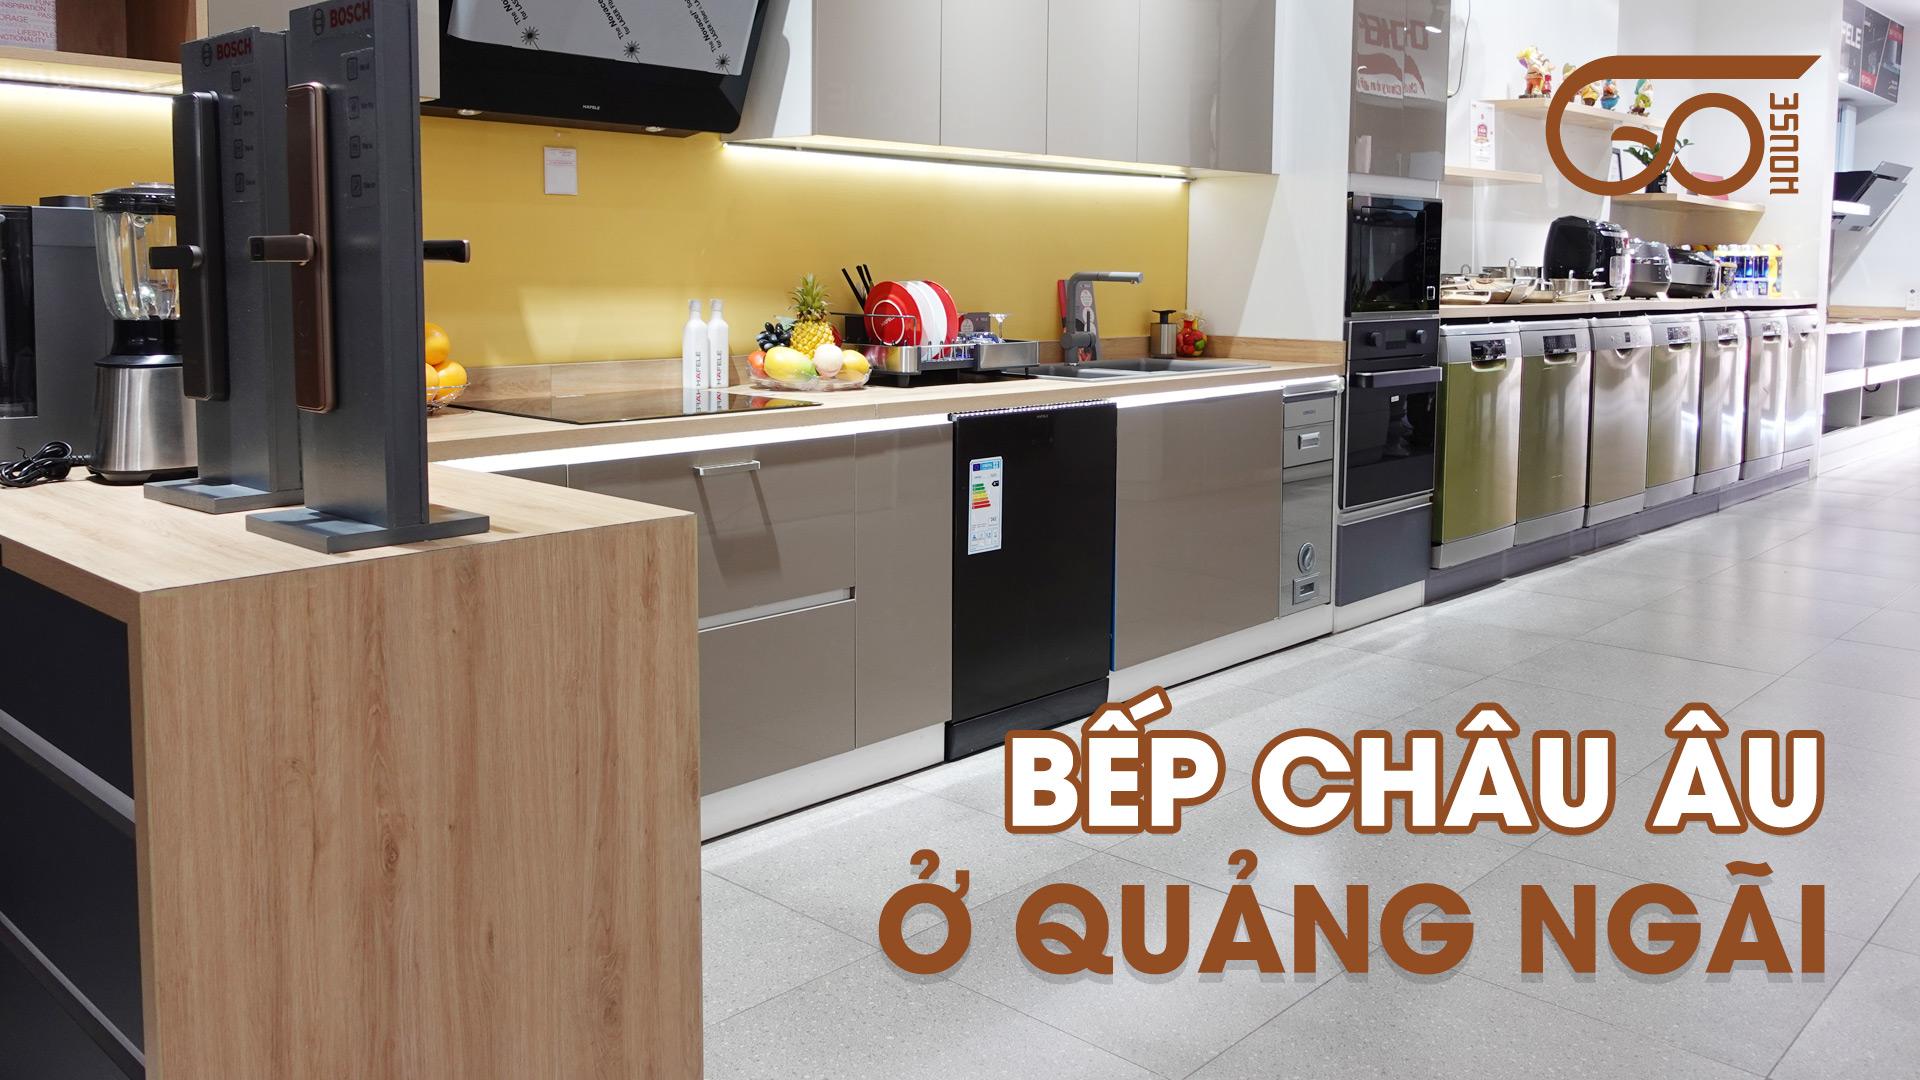 bep-chau-au-o-quang-ngai